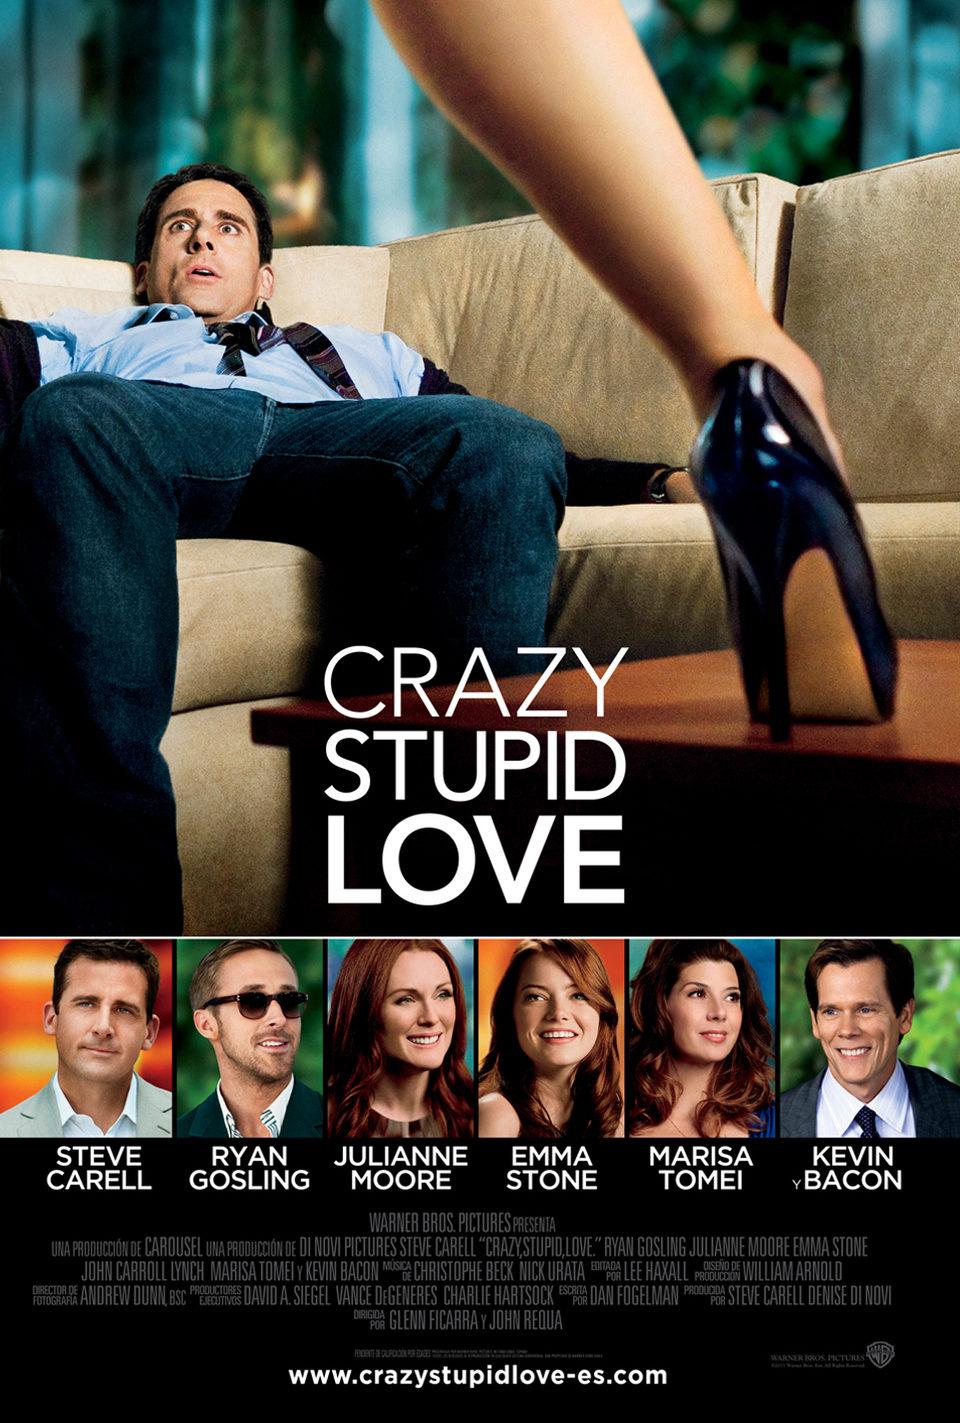 Cartel España de 'Crazy, Stupid, Love'